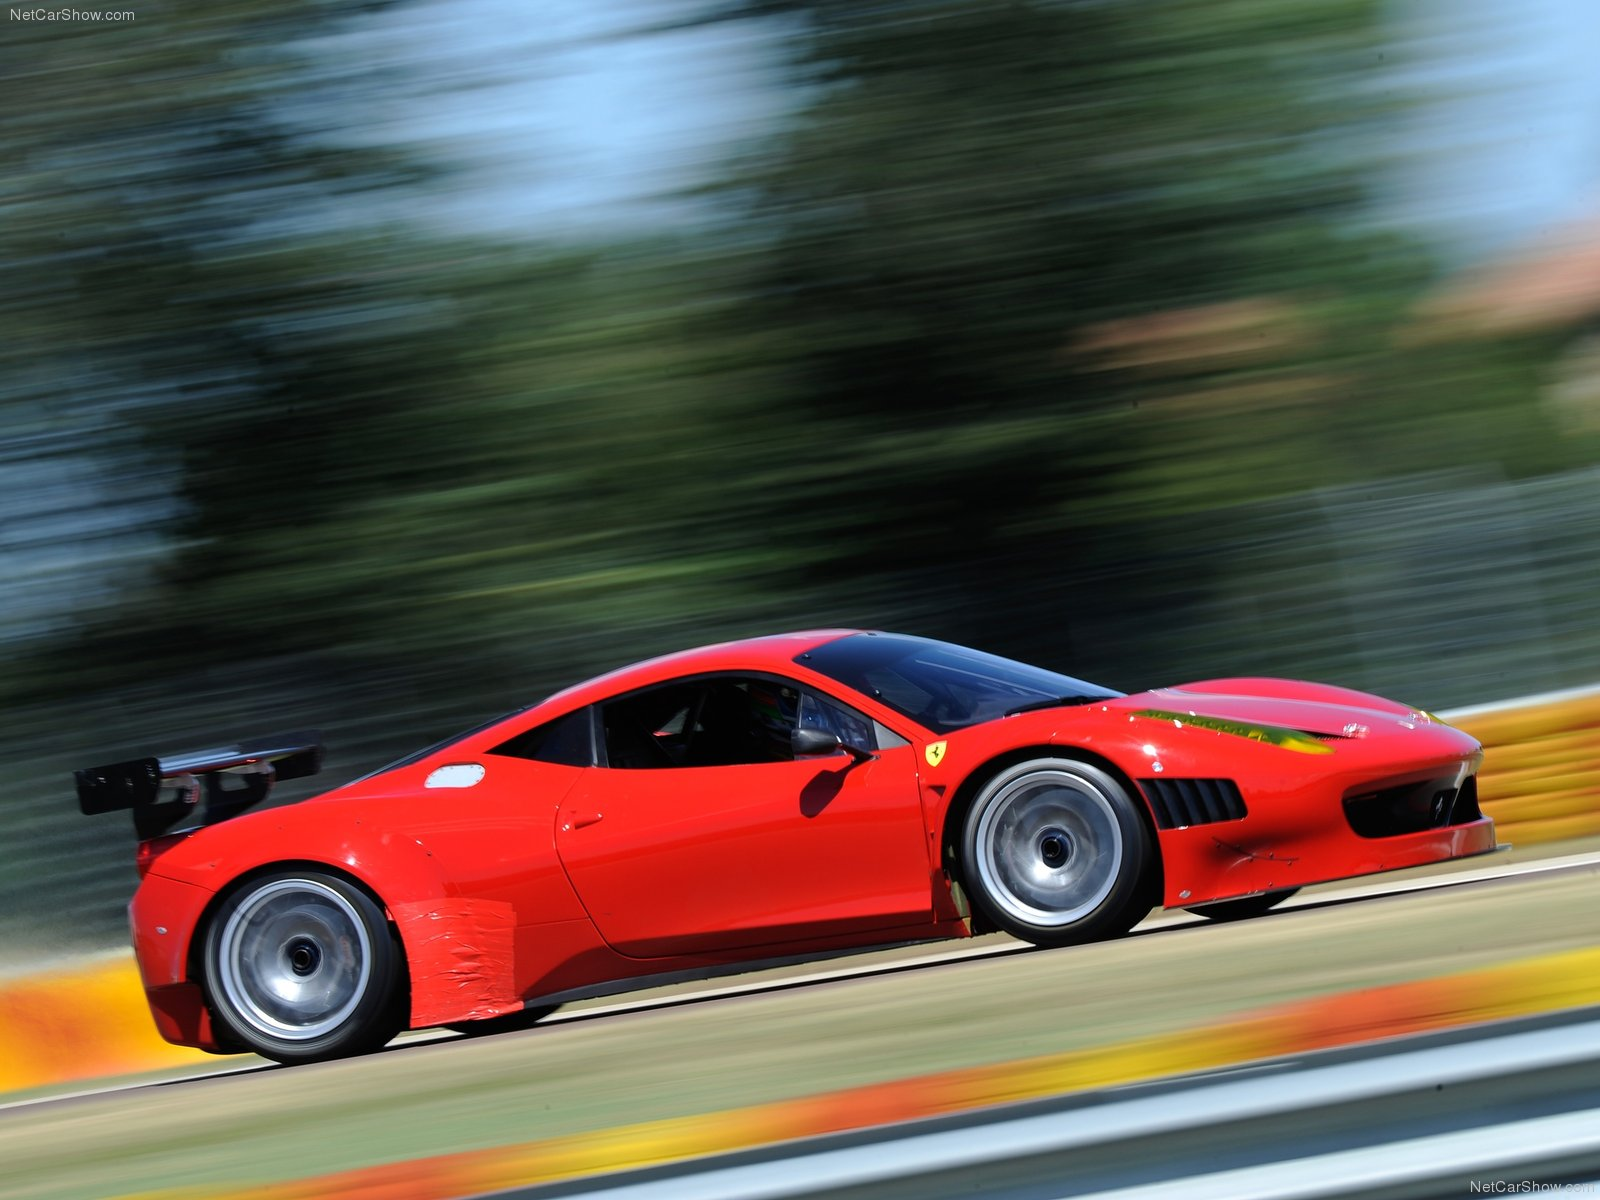 Hình ảnh siêu xe Ferrari 458 Italia Grand Am 2012 & nội ngoại thất